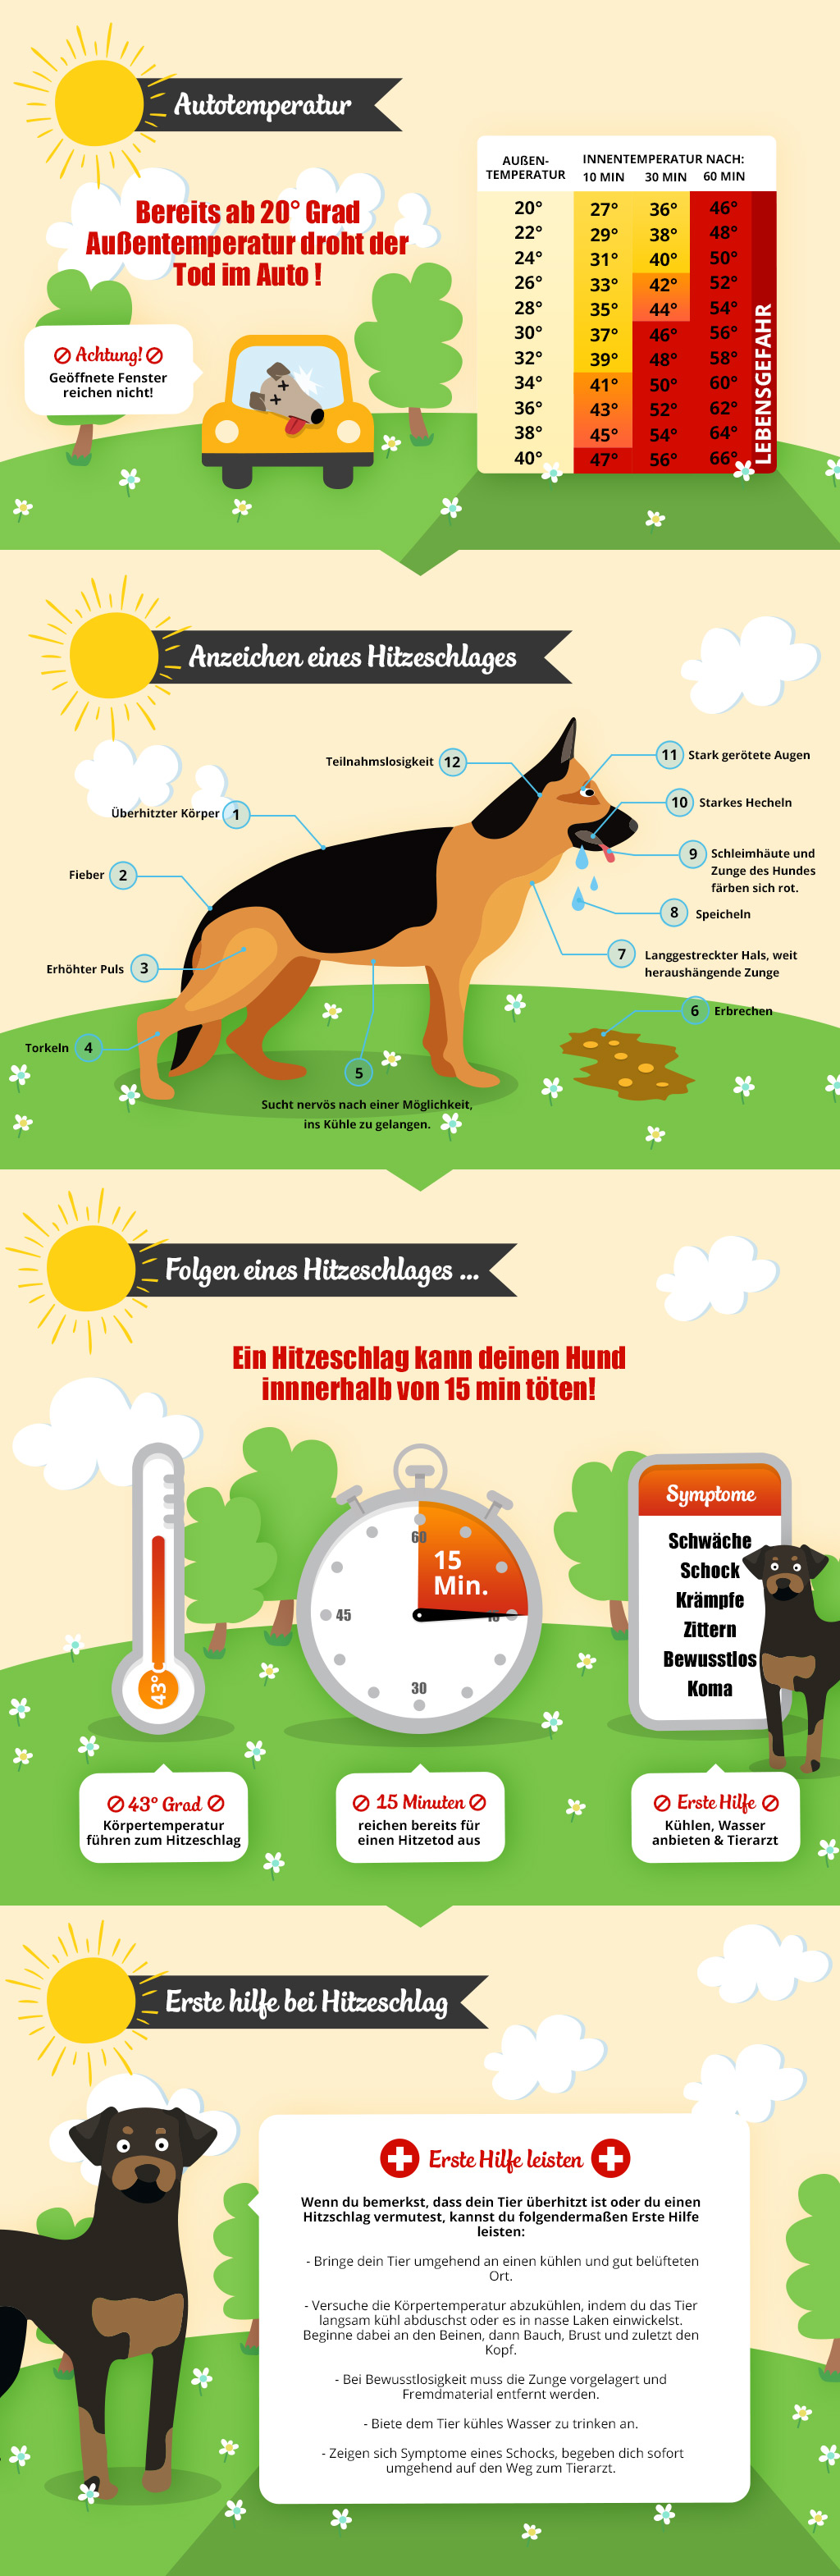 Auto_Hund_Hitze_Gefahr_Tot_Infographic_